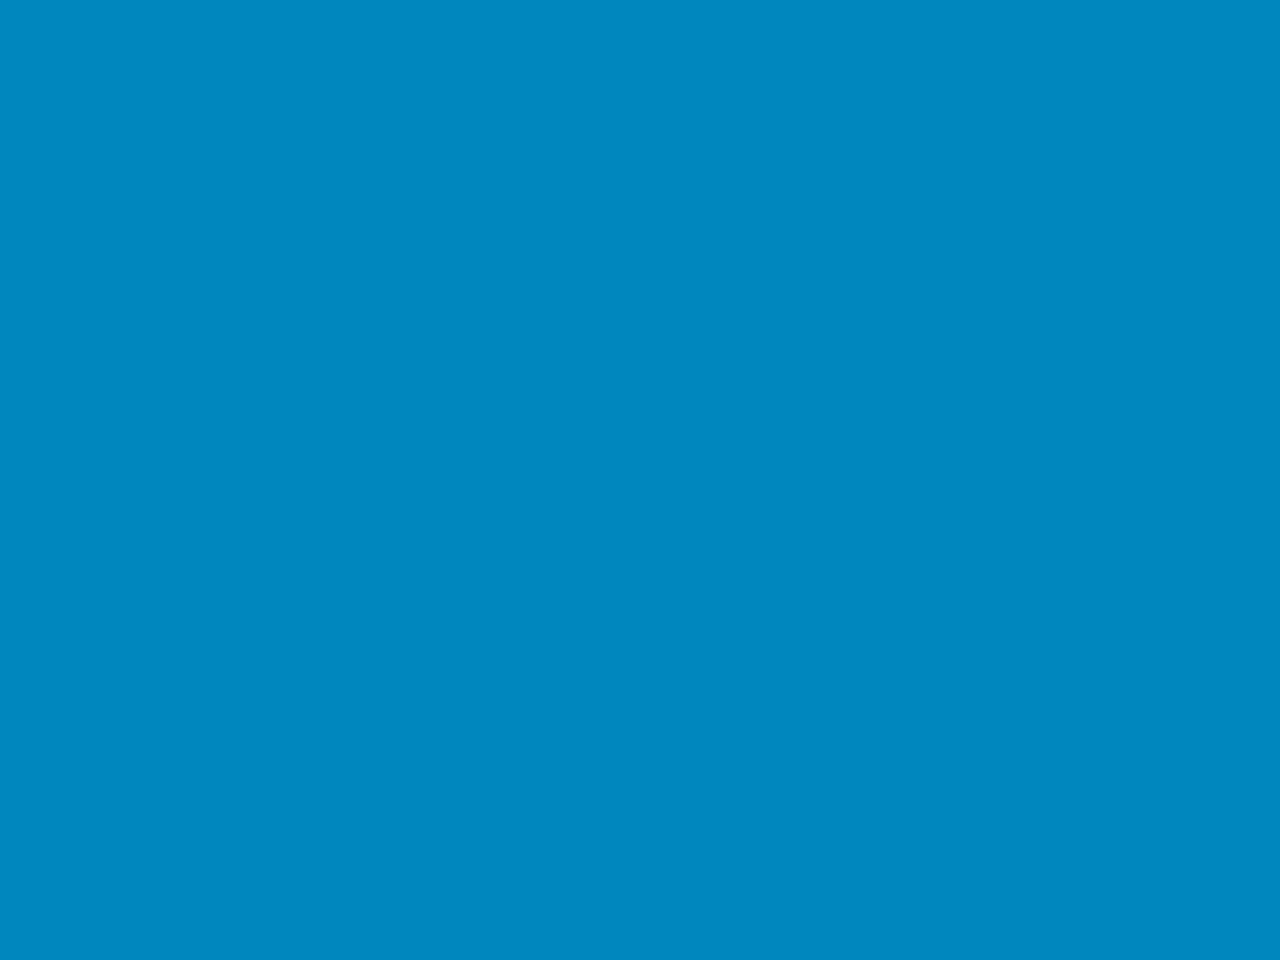 1280x960 Blue NCS Solid Color Background